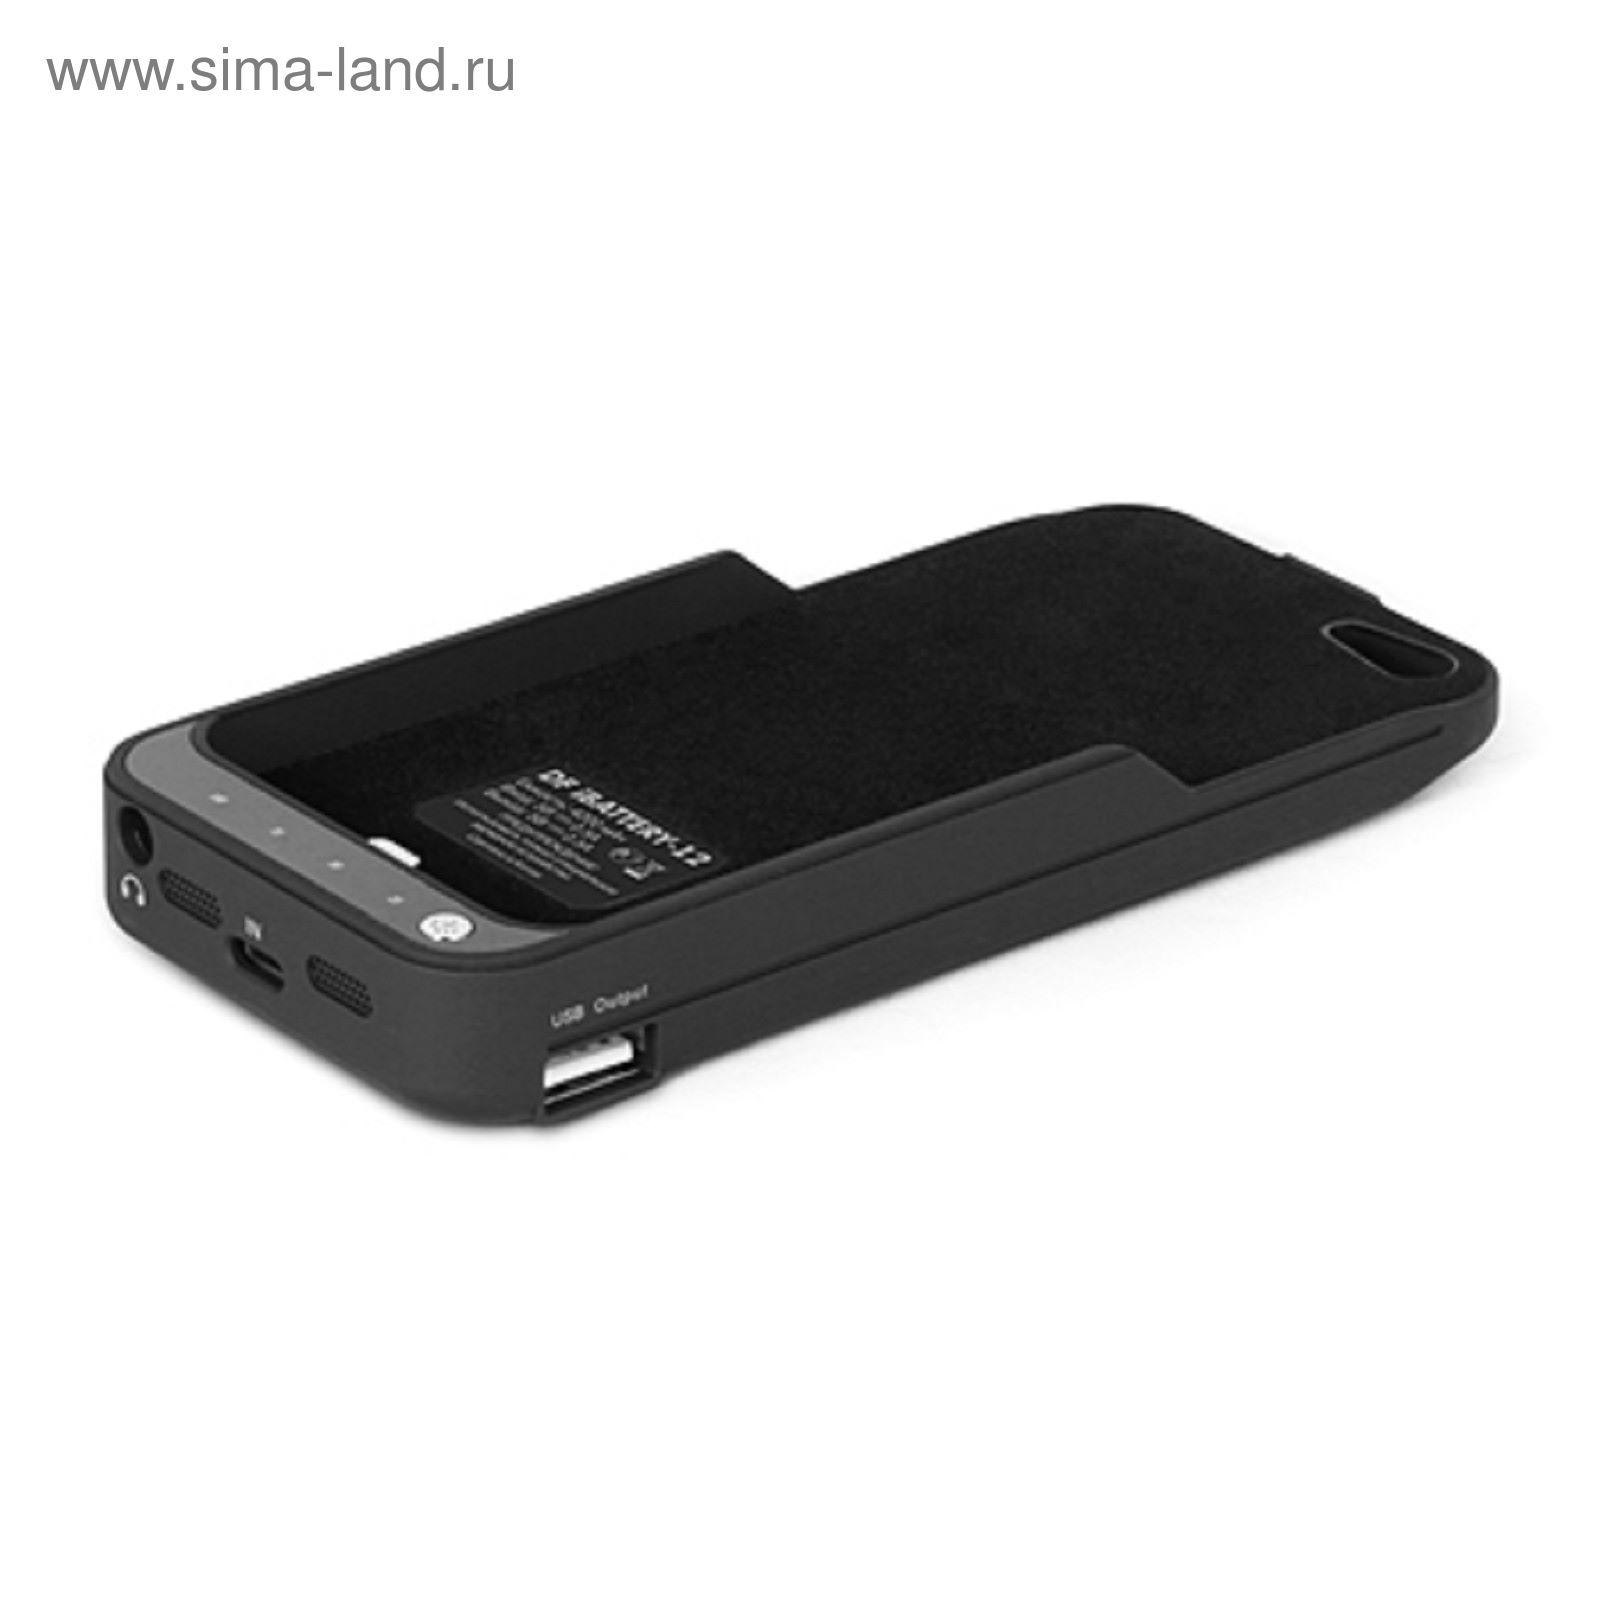 25efef5bc4ed2 Аккумулятор-чехол DF iBattery-12 iPhone 5/5S, черный 4200 mAh серия ...